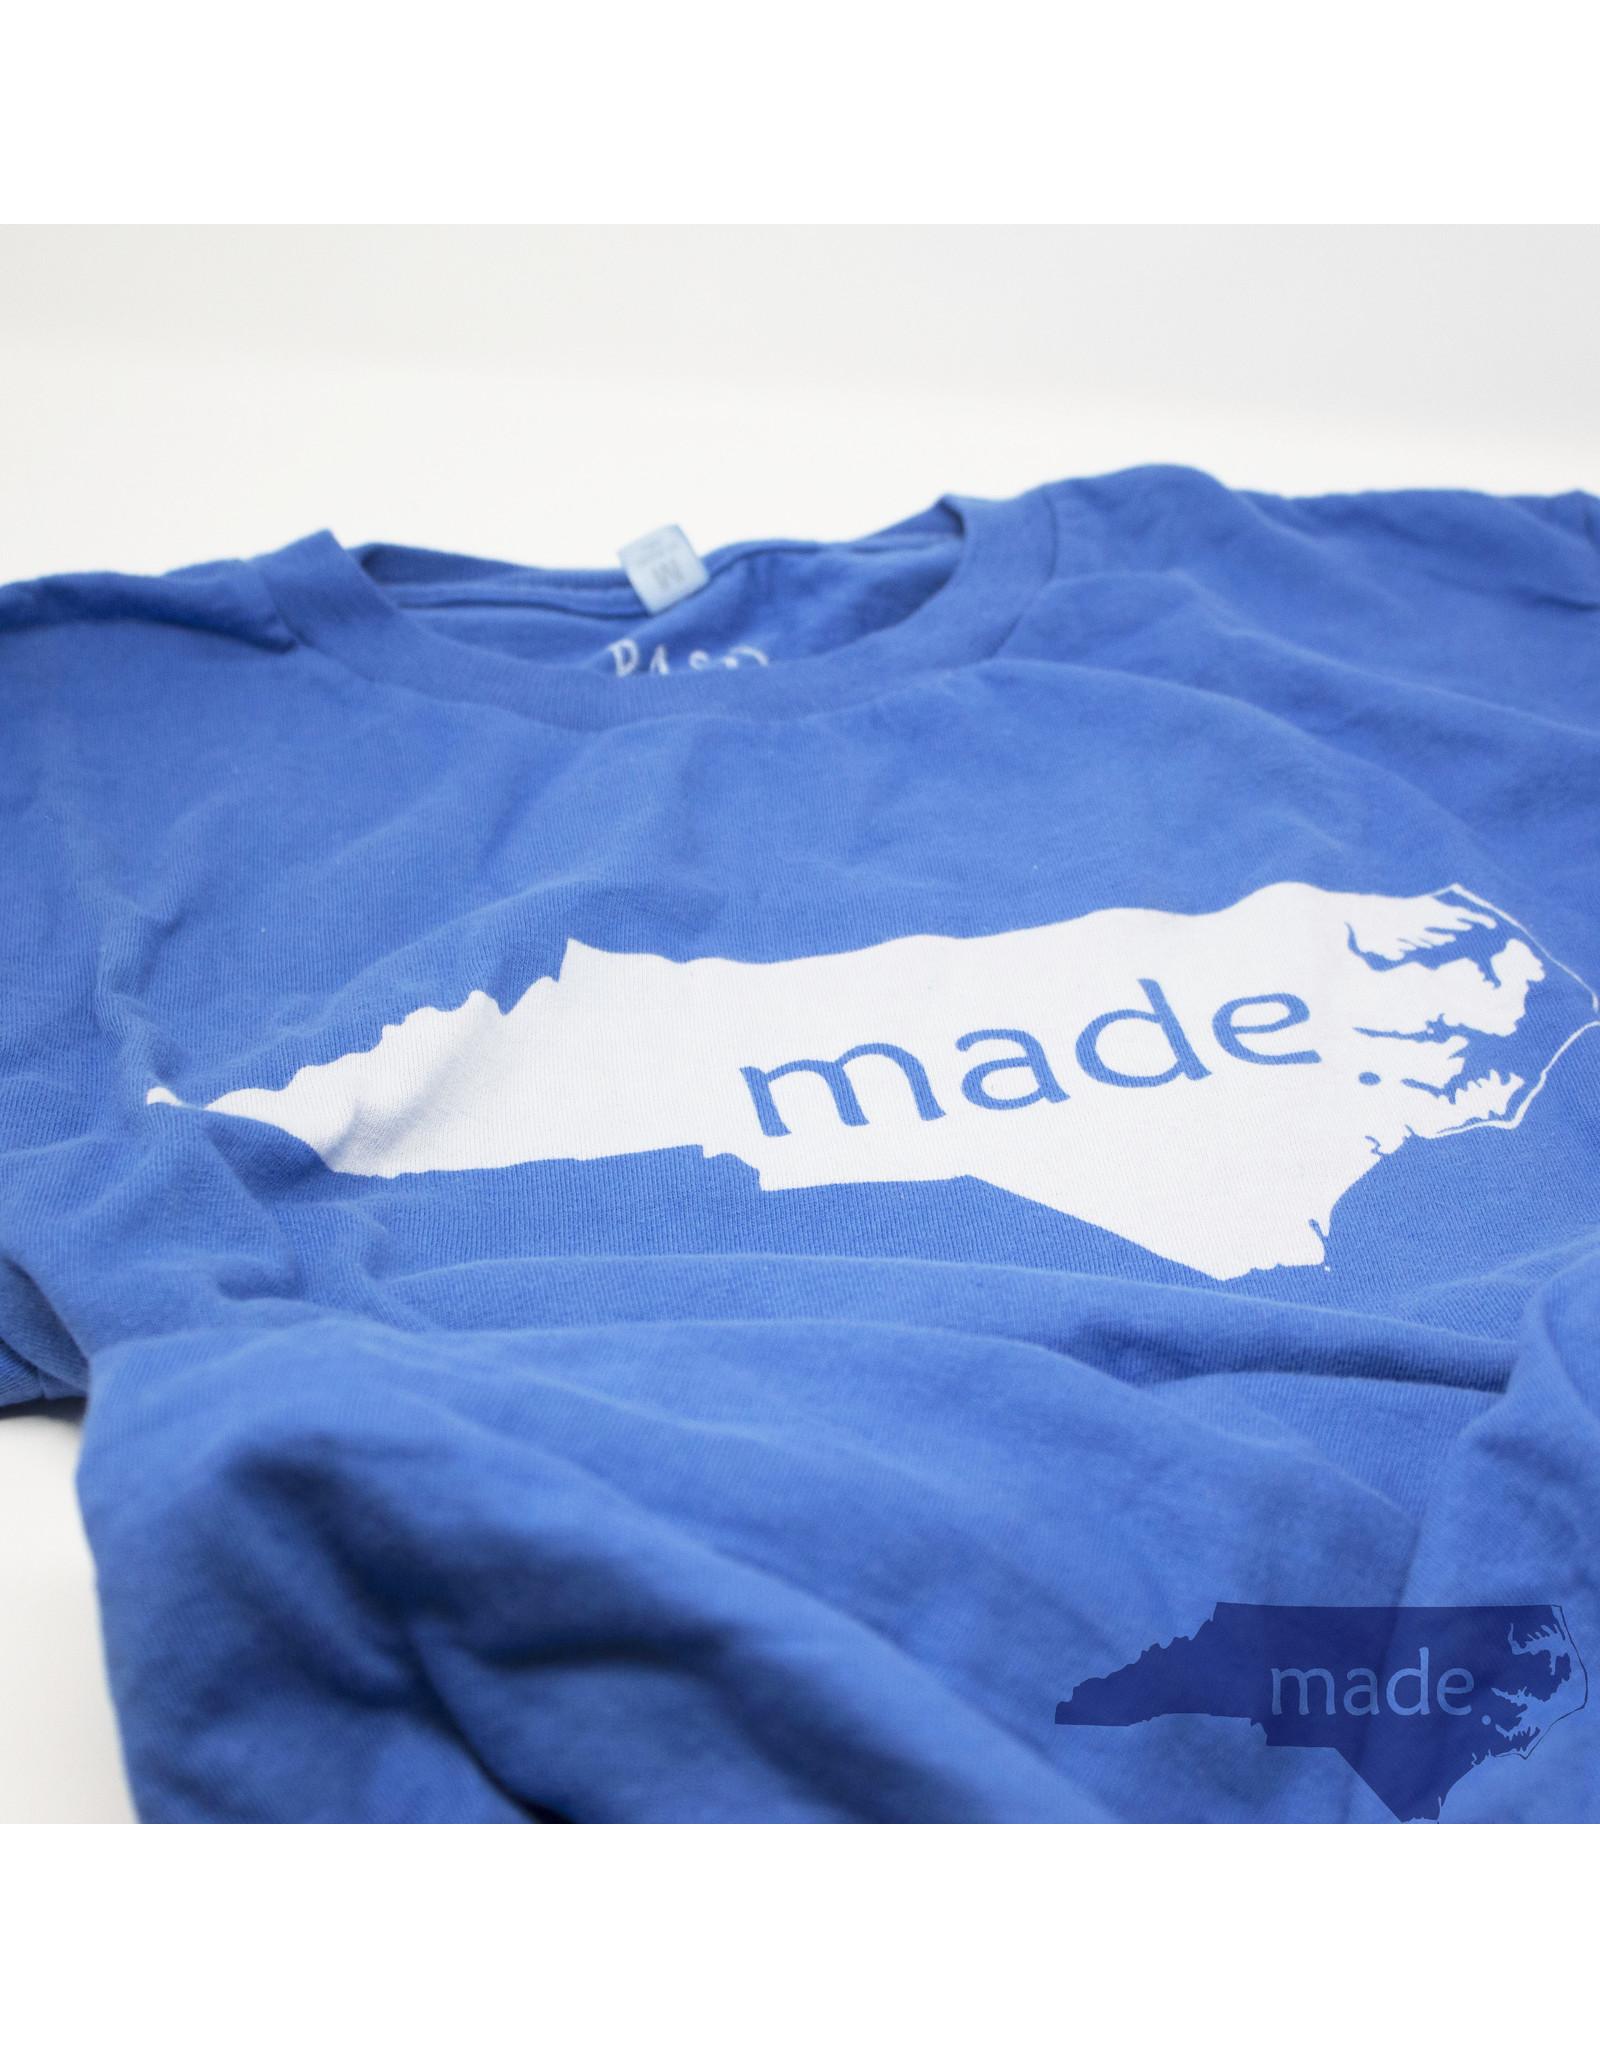 Pass The Gravy Made In NC T Shirt Blue Medium - Pass The Gravy